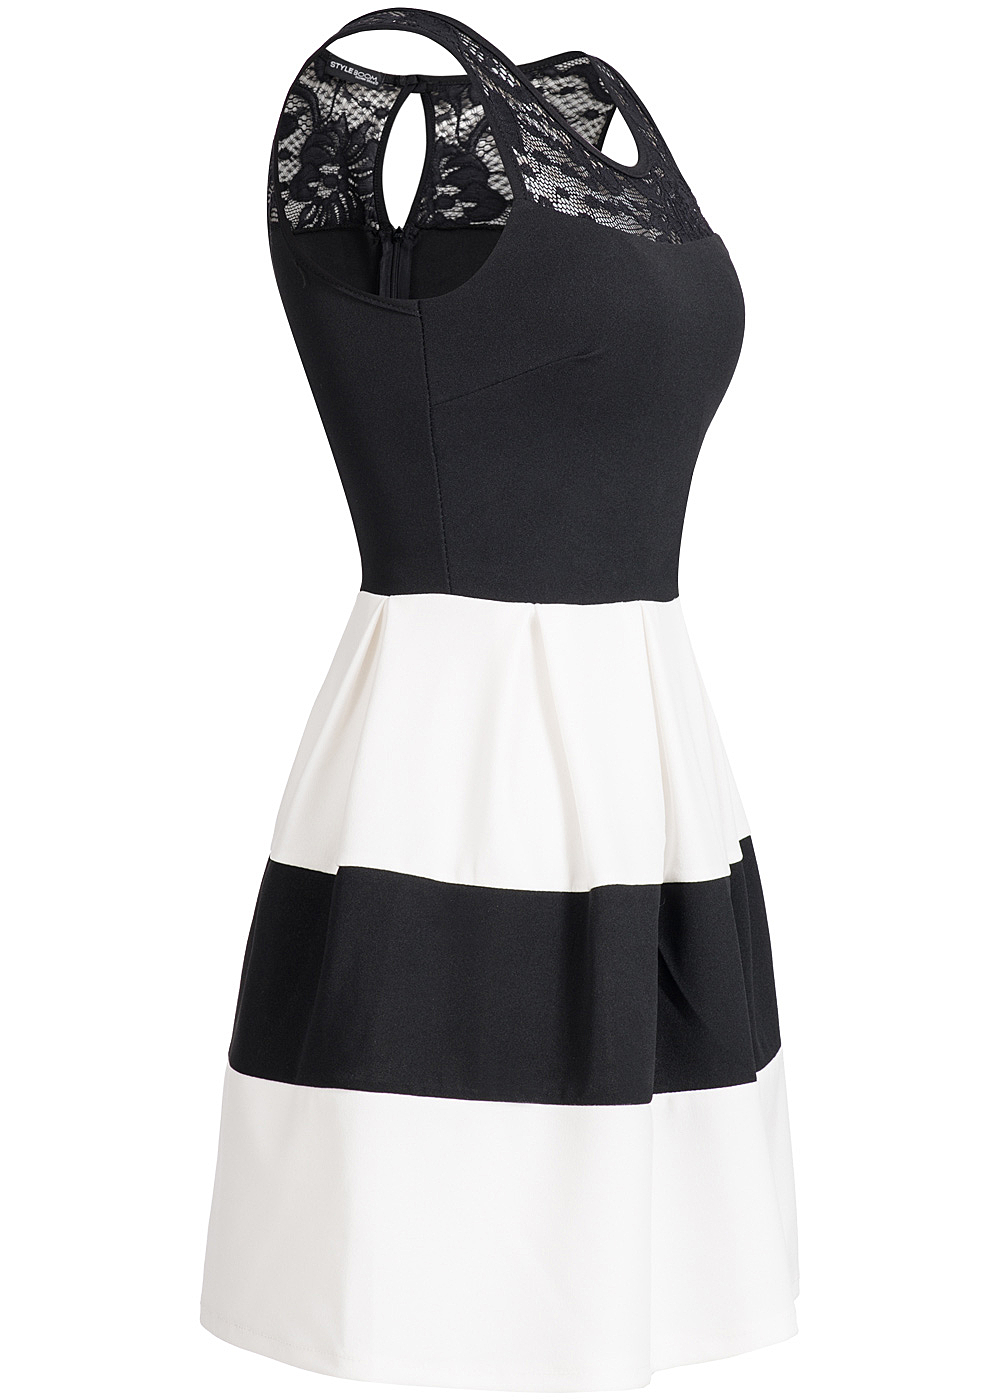 styleboom fashion damen mini kleid zipper hinten brustpads. Black Bedroom Furniture Sets. Home Design Ideas